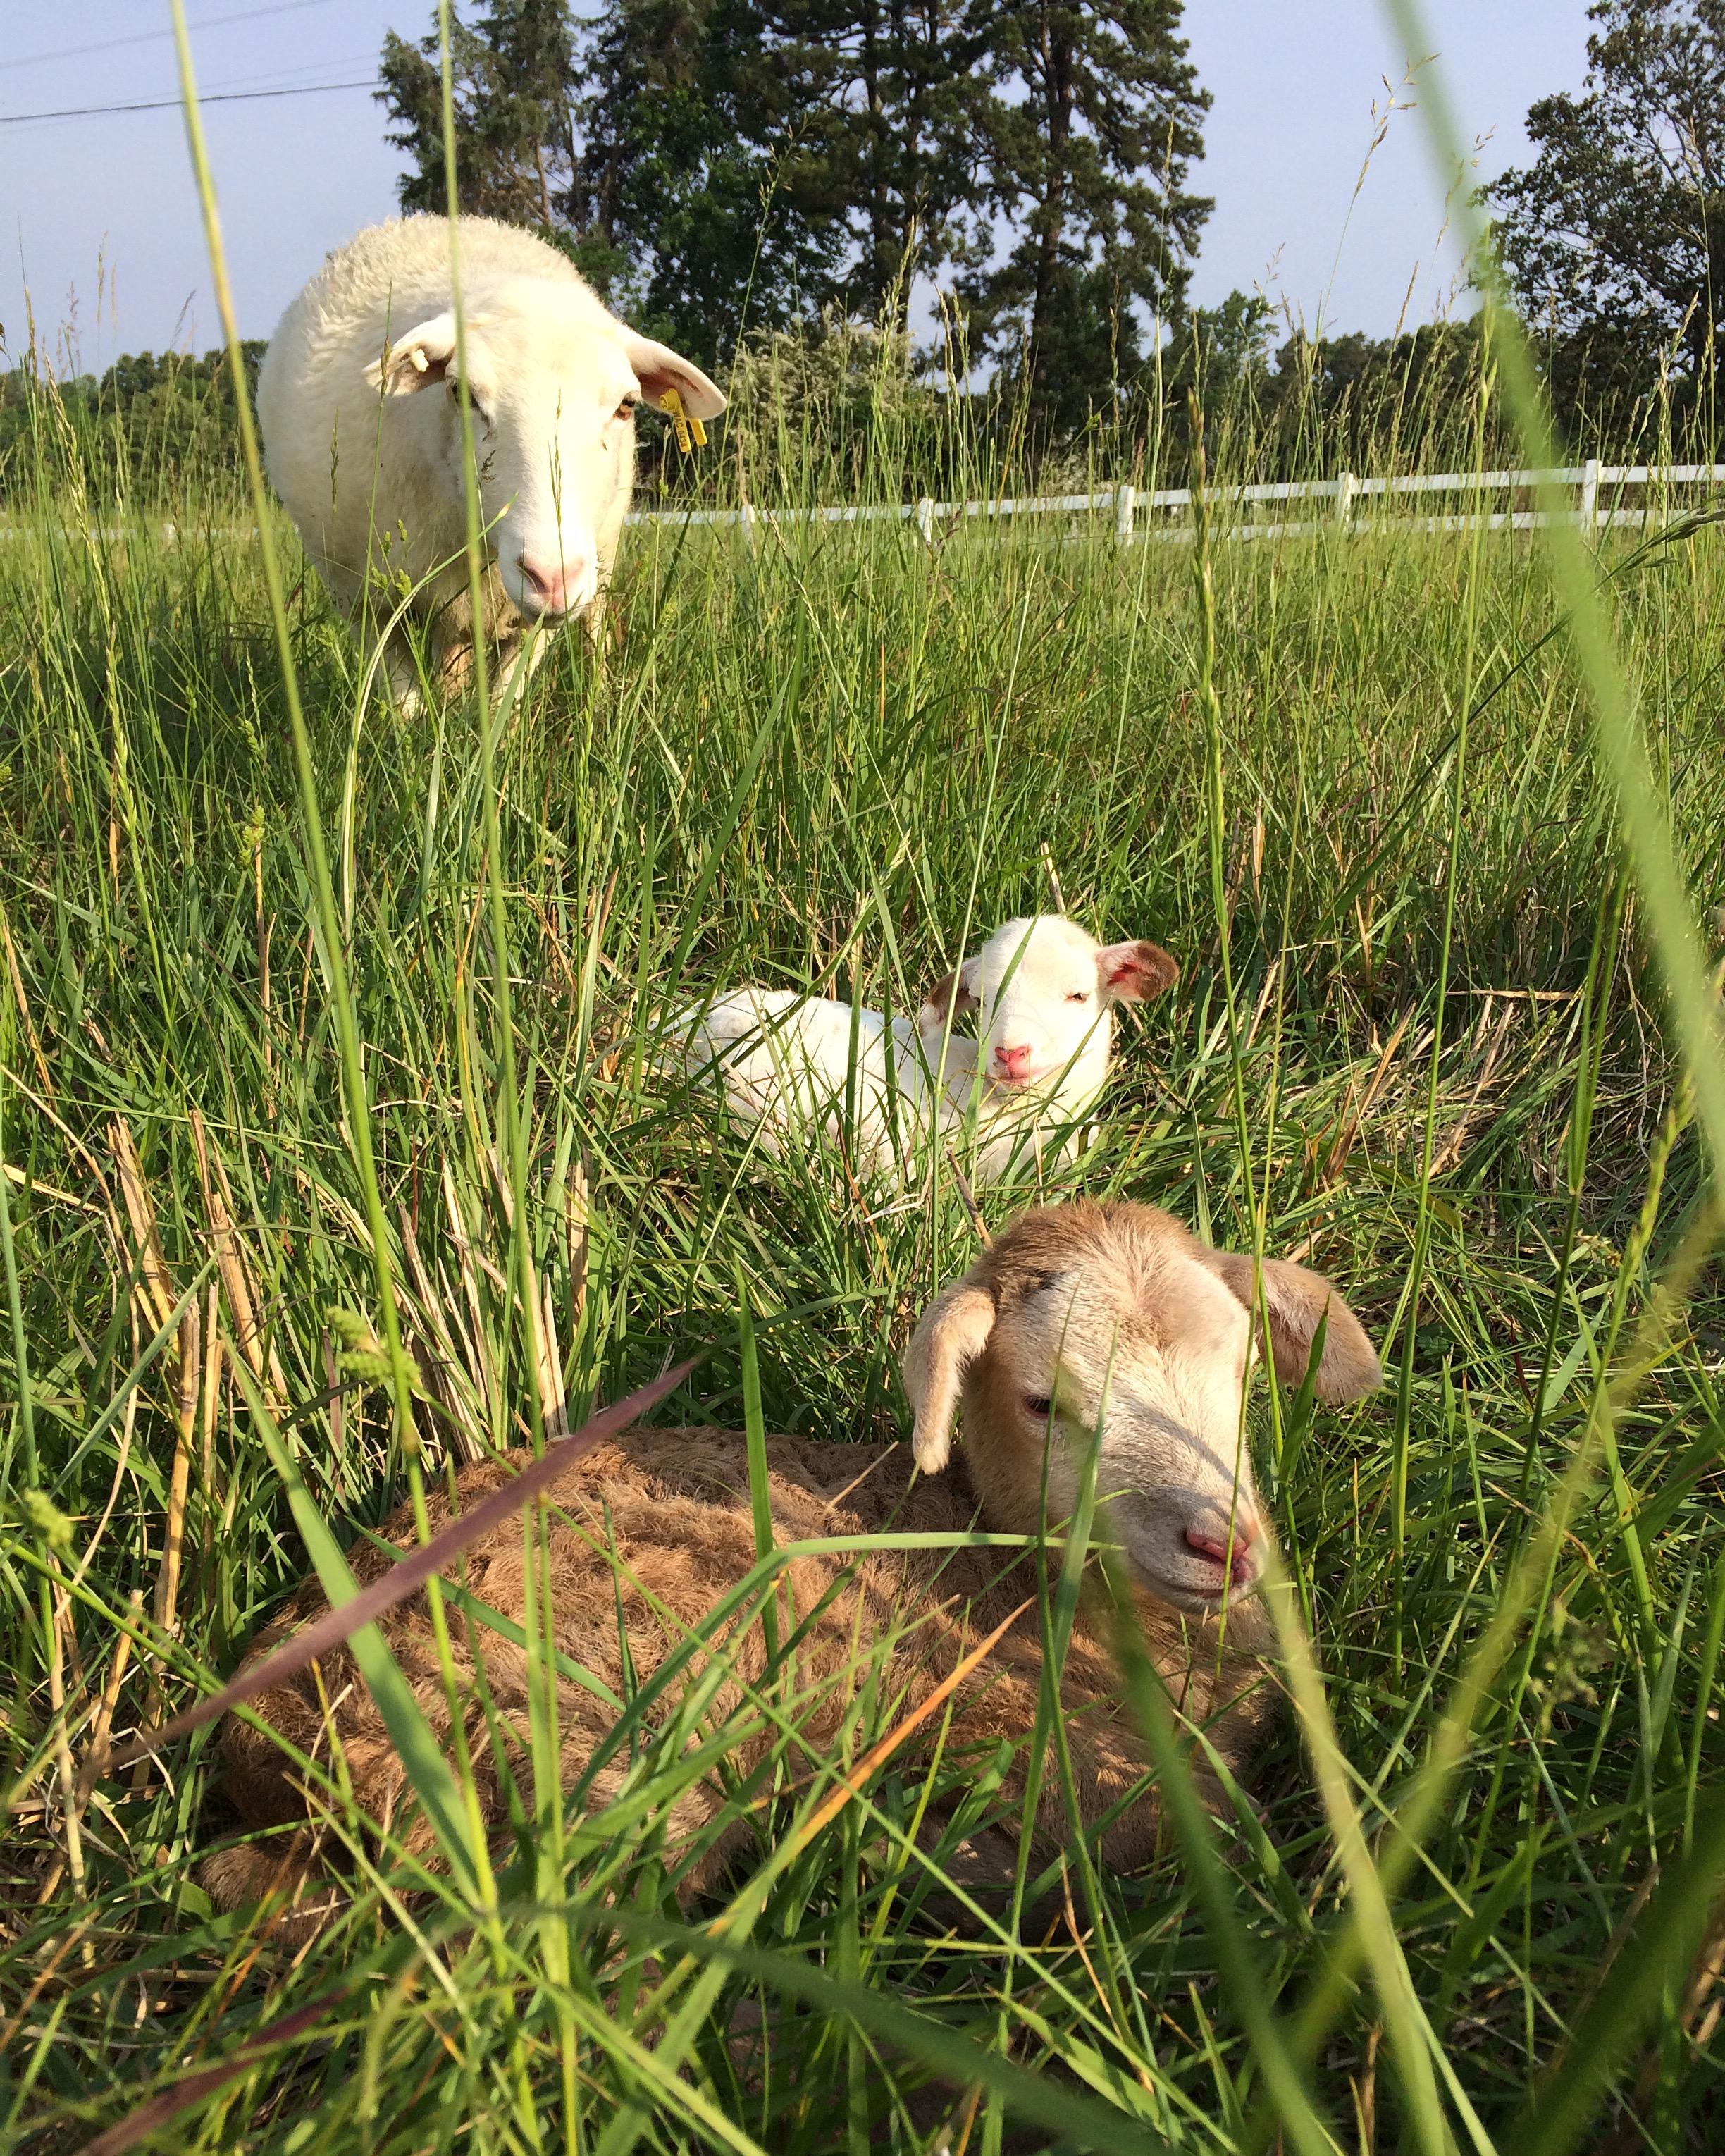 Lambing season is always fun and adorable.